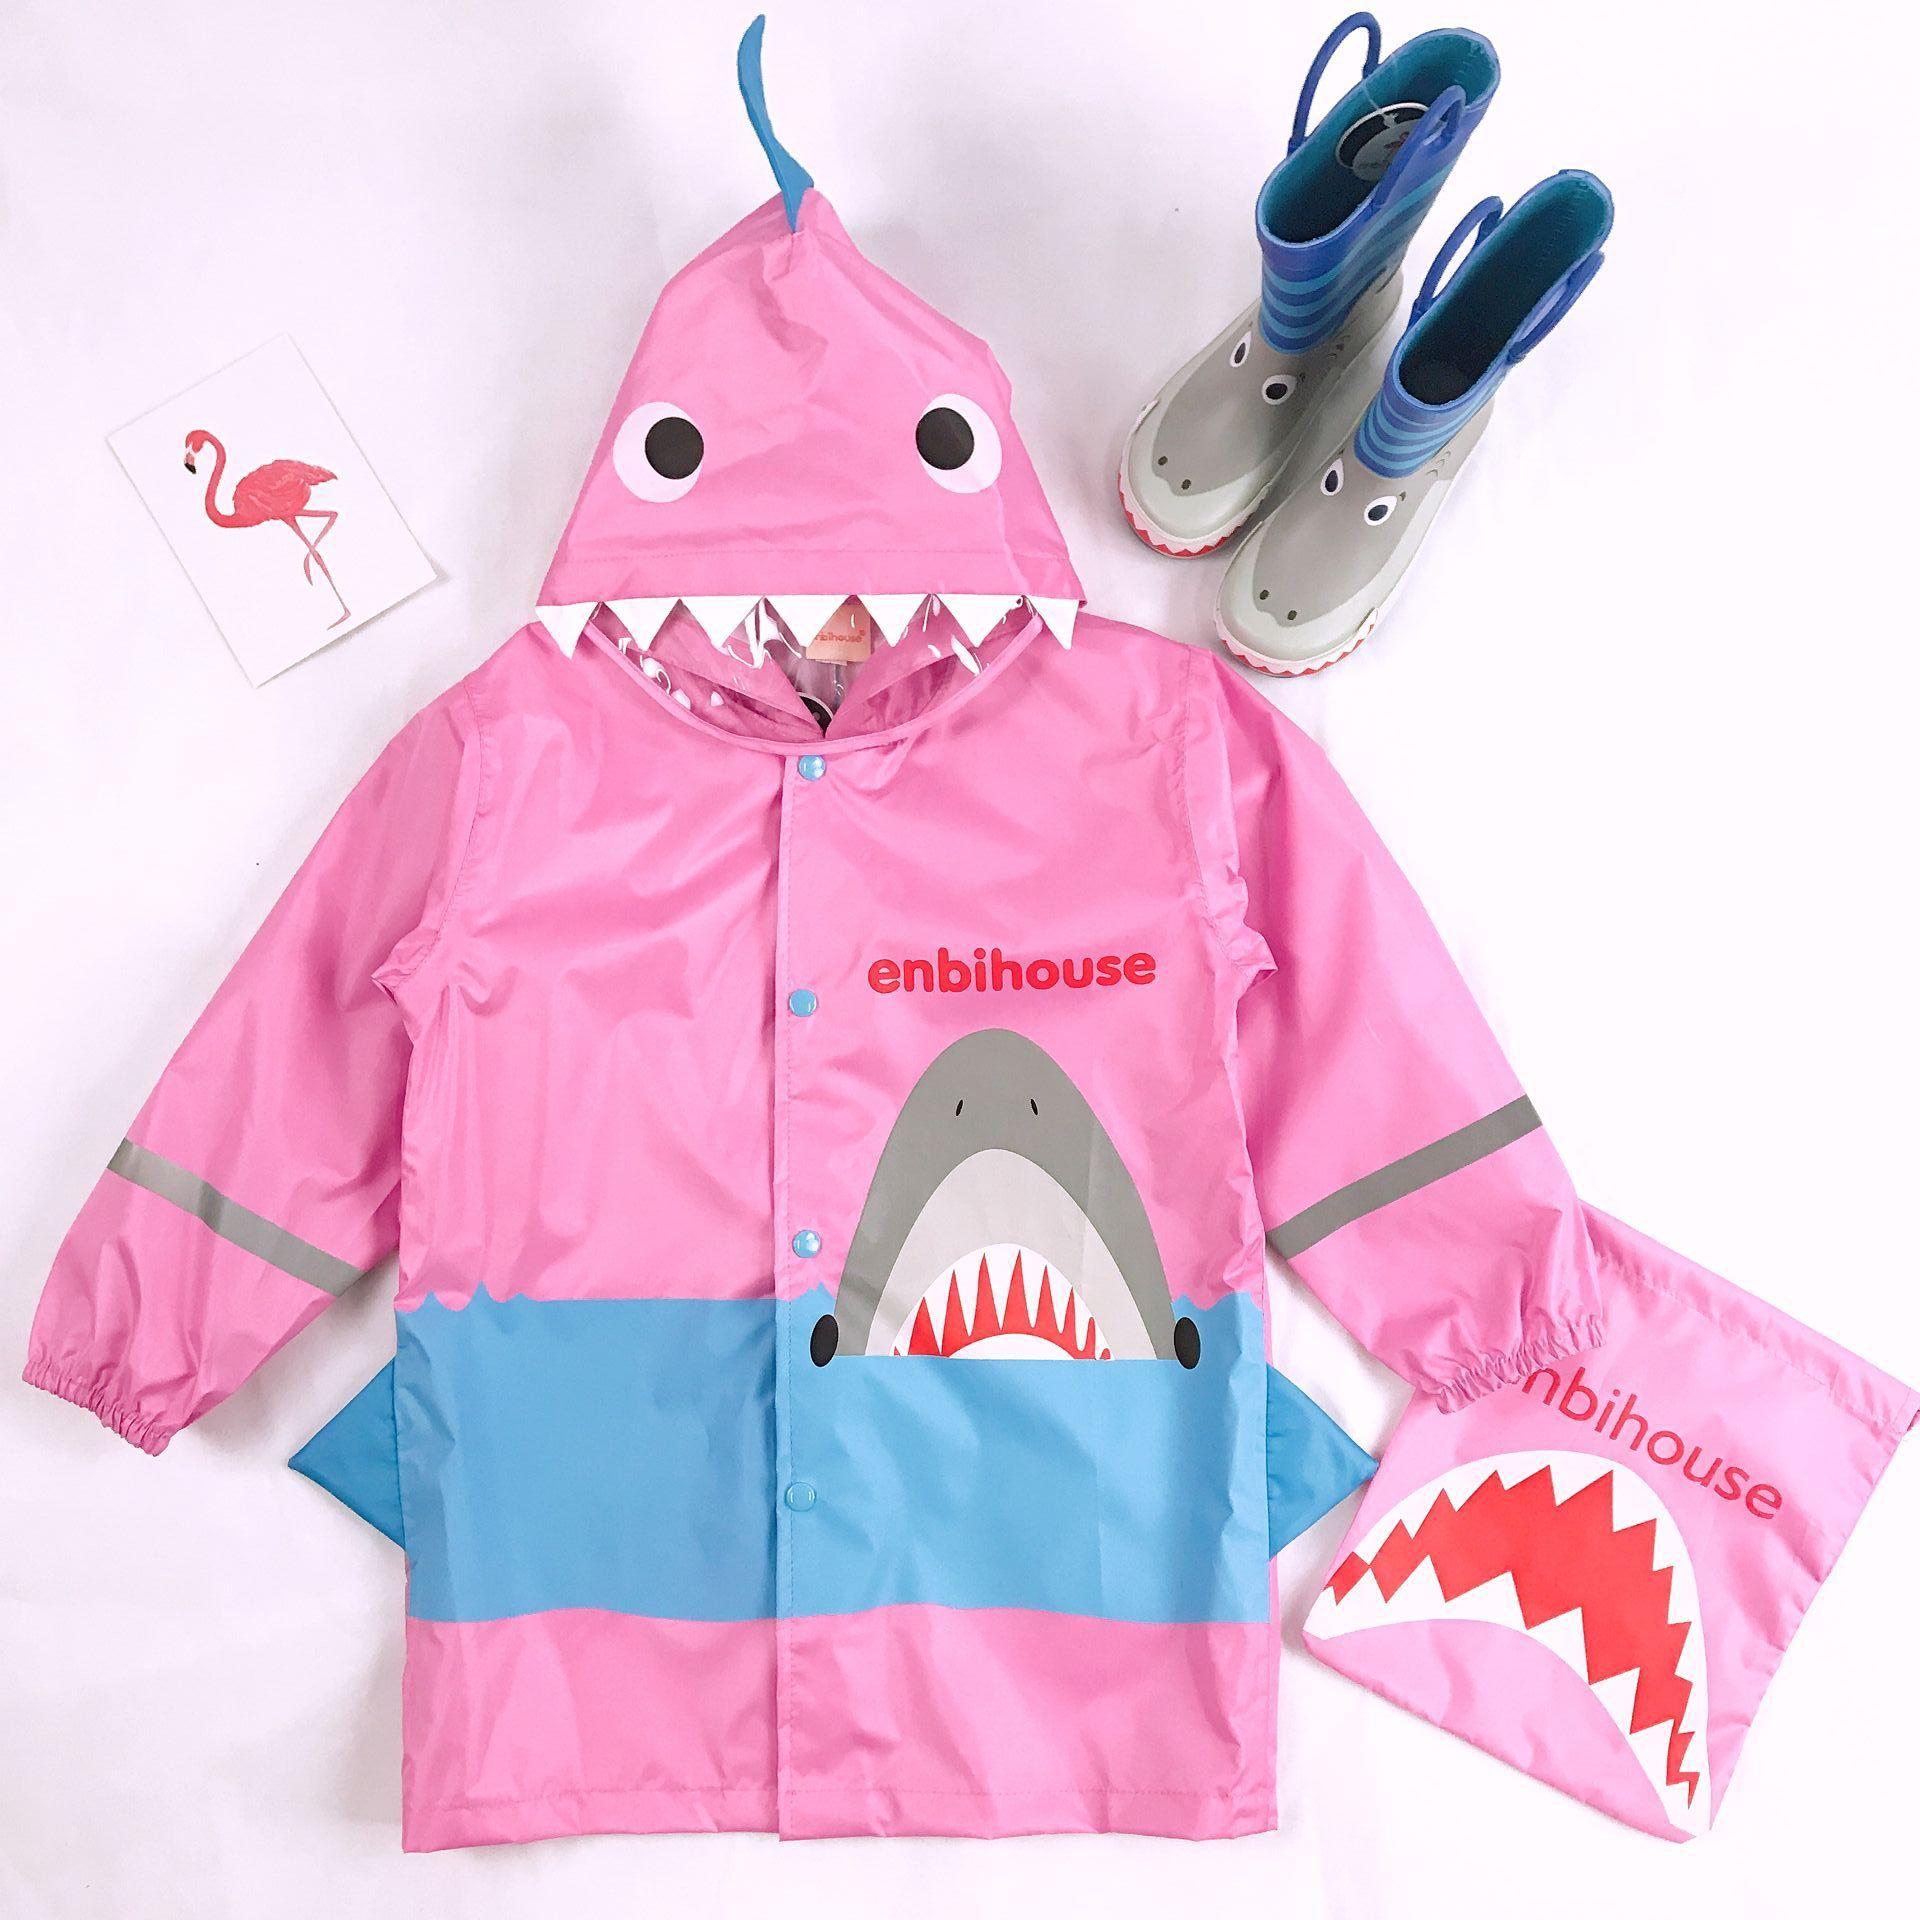 animal tubarão forma roupas 3d estéreo capa